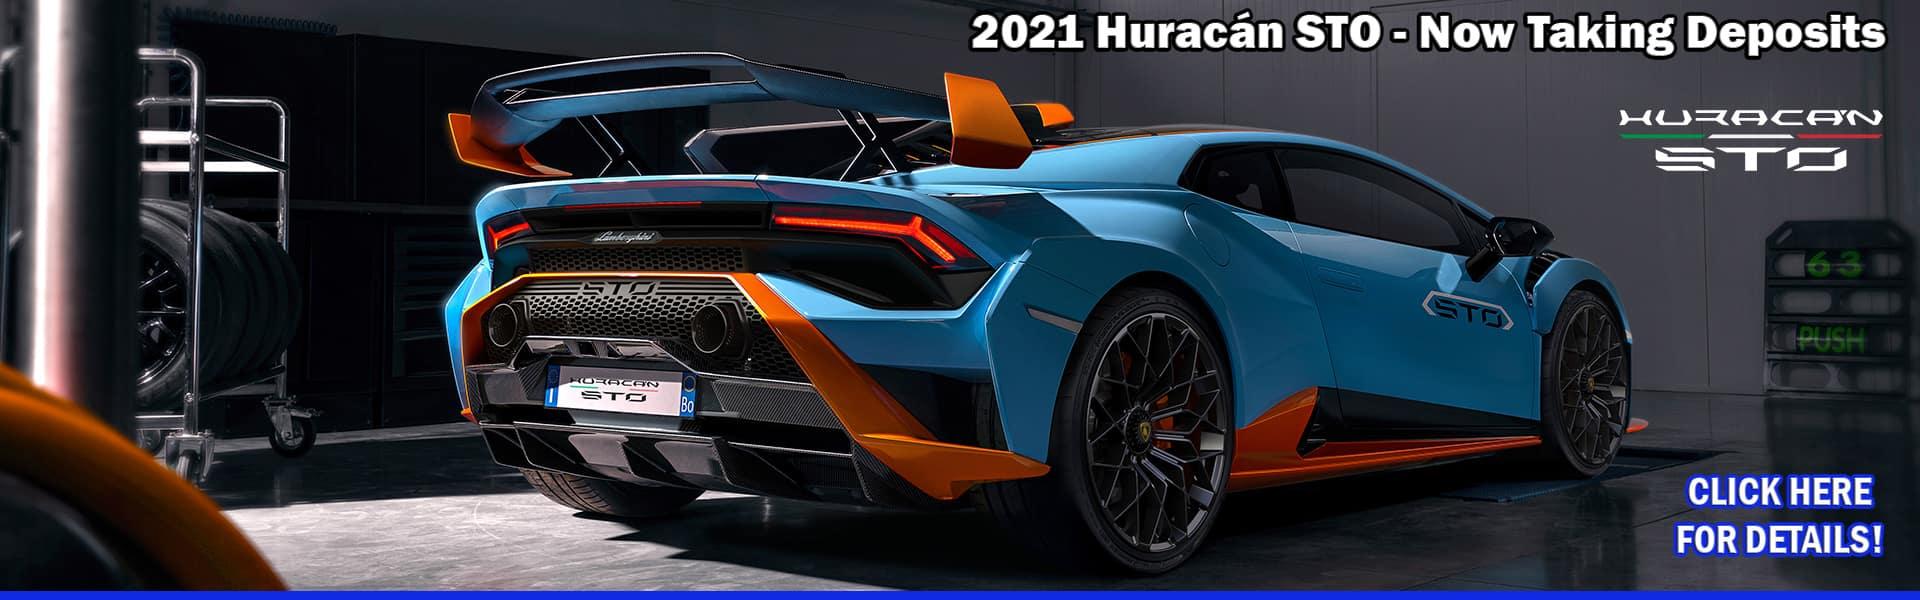 2021 Lamborghini Huracan STO in Colorado